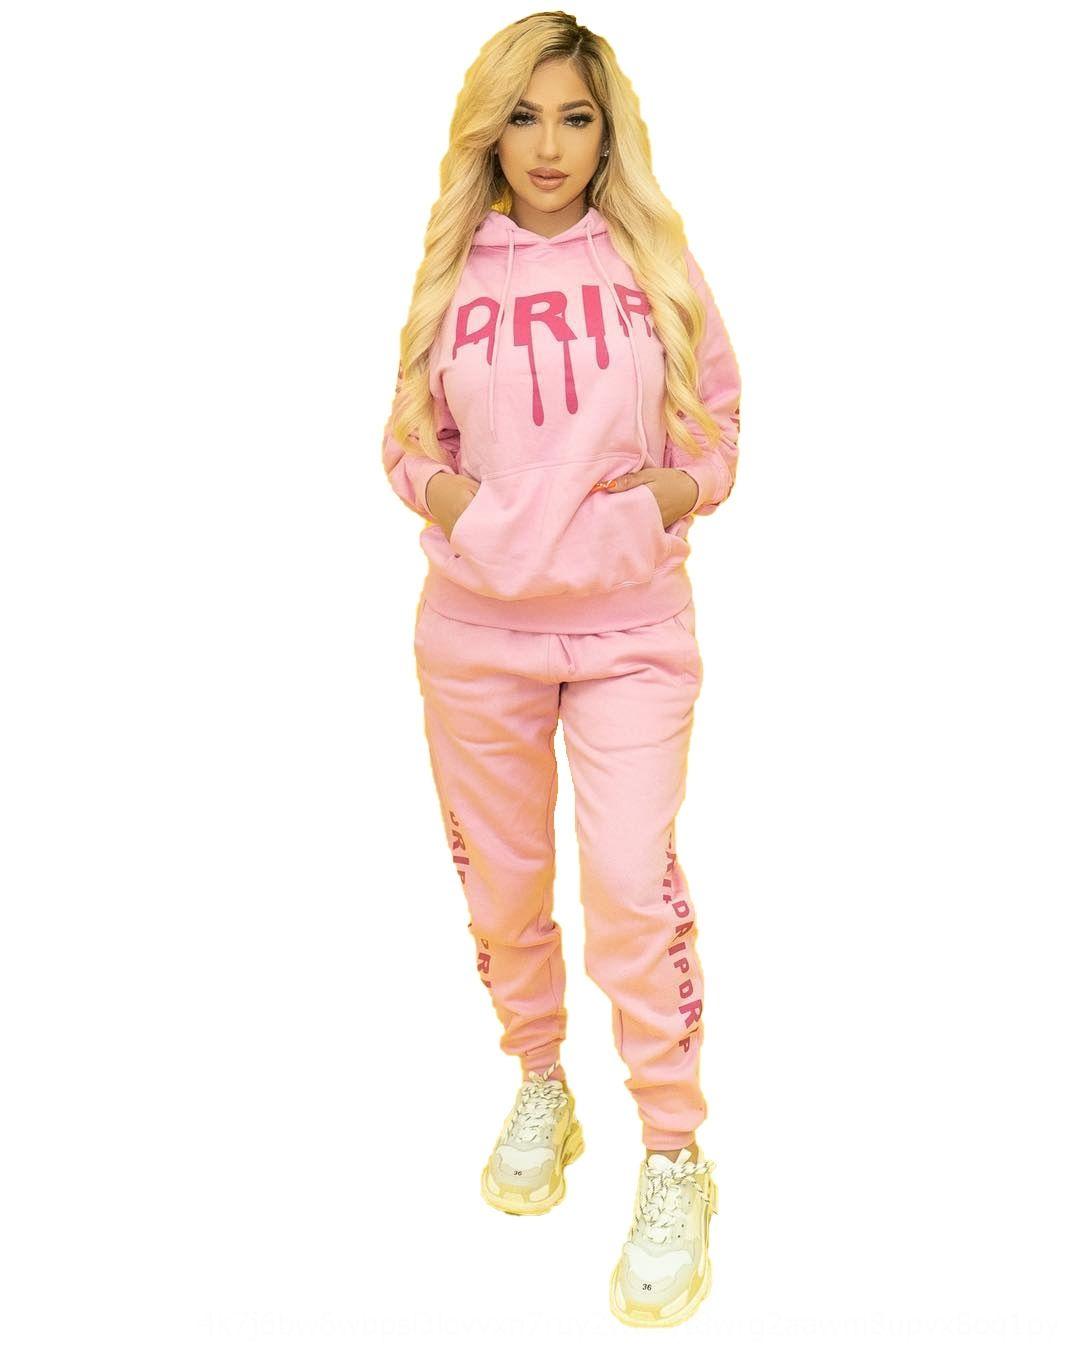 2iql Jeans Jeans Jacks 2 Piece 3676 Cardigan Legging Outfits S-2XL Felpe Felpe Pannelli Denim pannelli Casual Fall Abbigliamento Set di abbigliamento Jogger Suits w